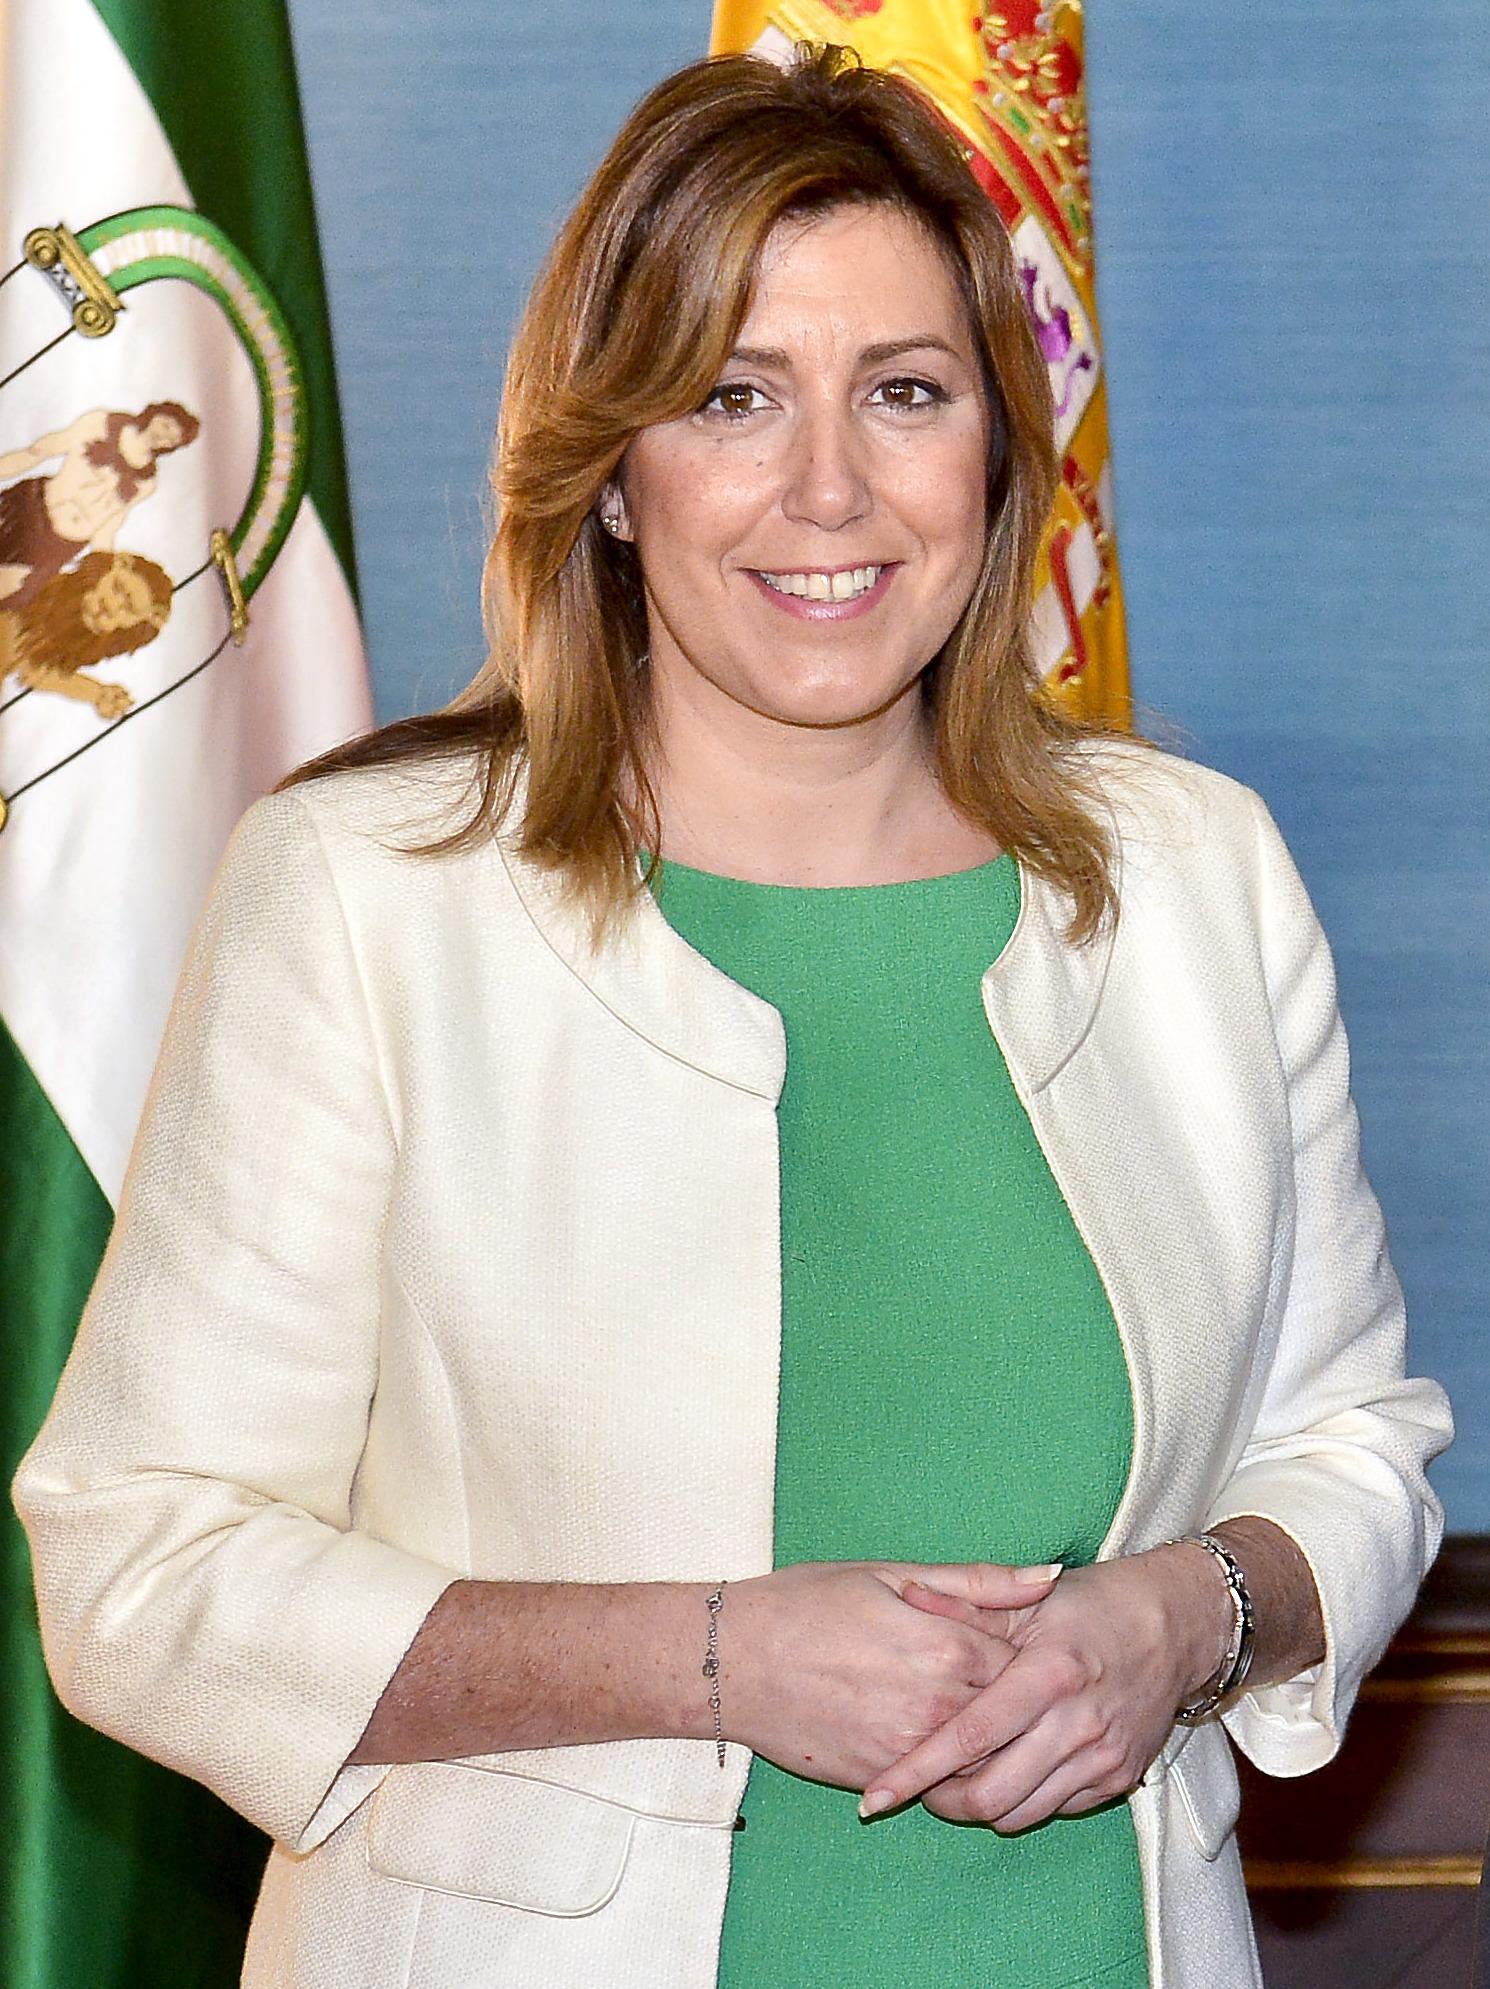 File:Zoido con Susana Díaz (cropped).jpg - Wikipedia